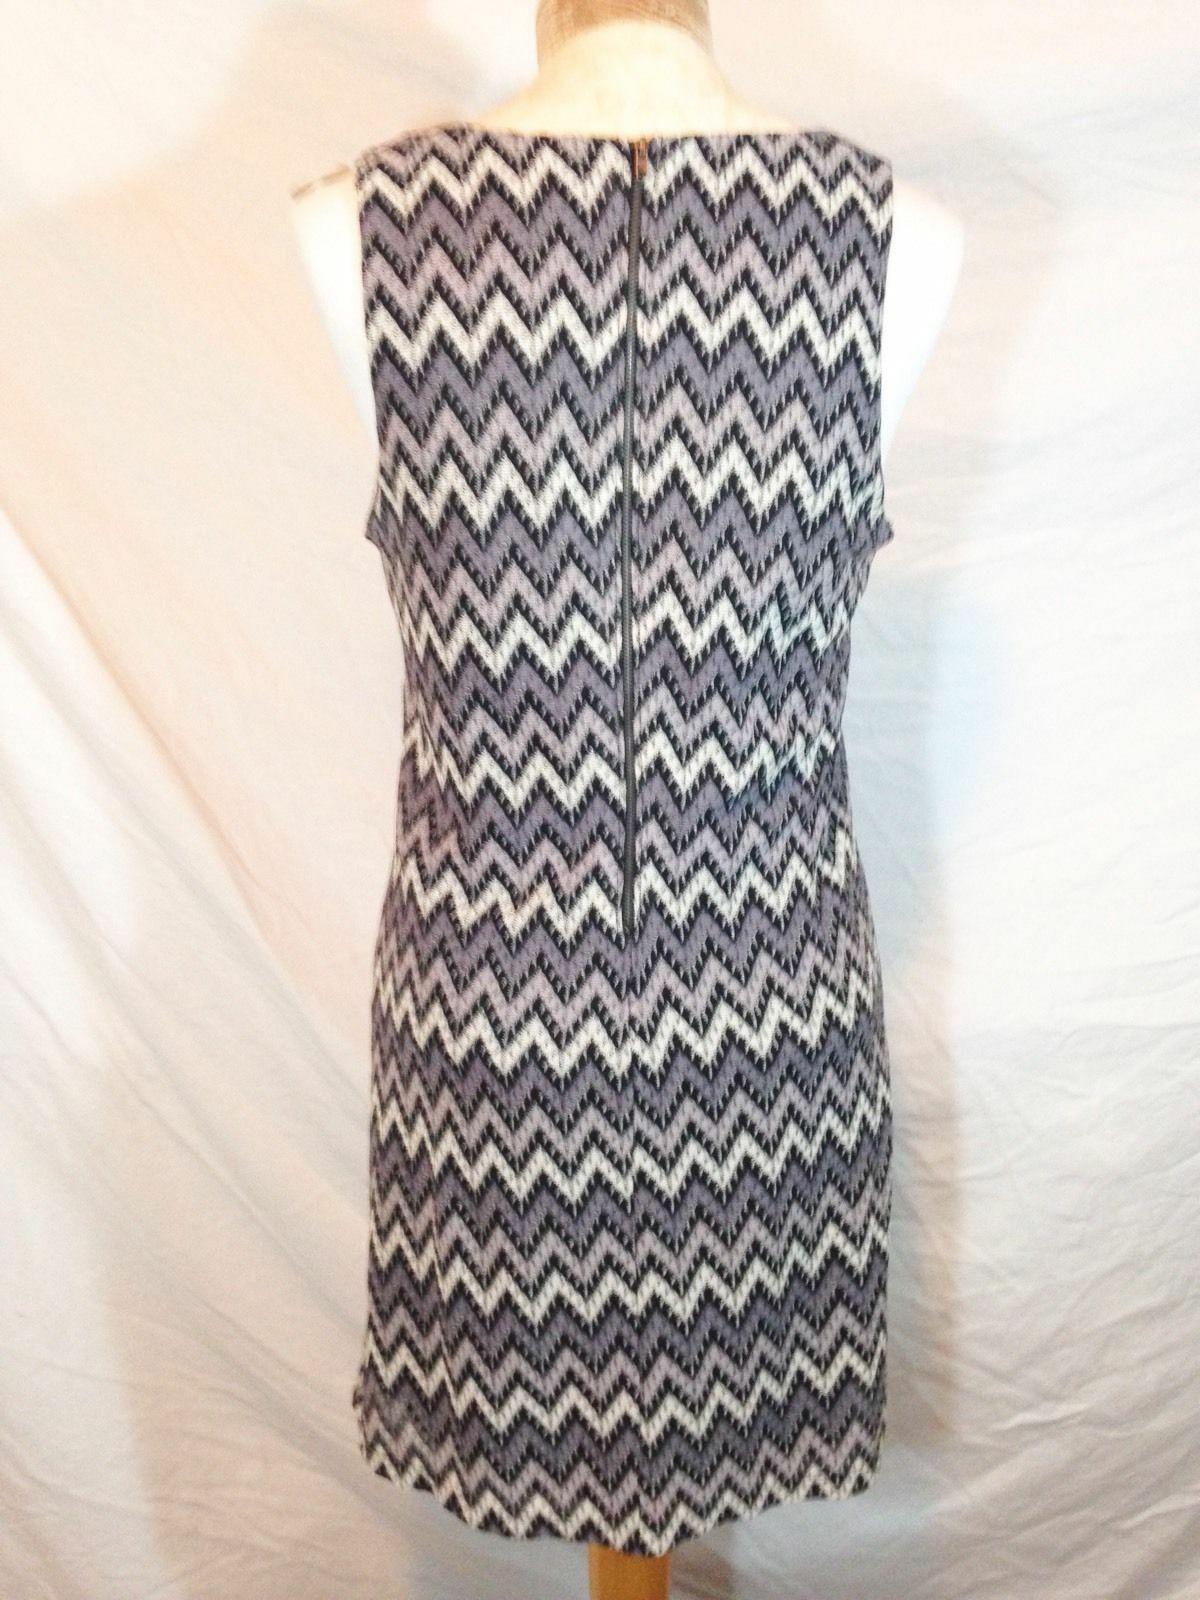 M/L Forever 21 Dress Gray Sleeveless Tank Bodycon Pencil Formal Zigzag Pattern